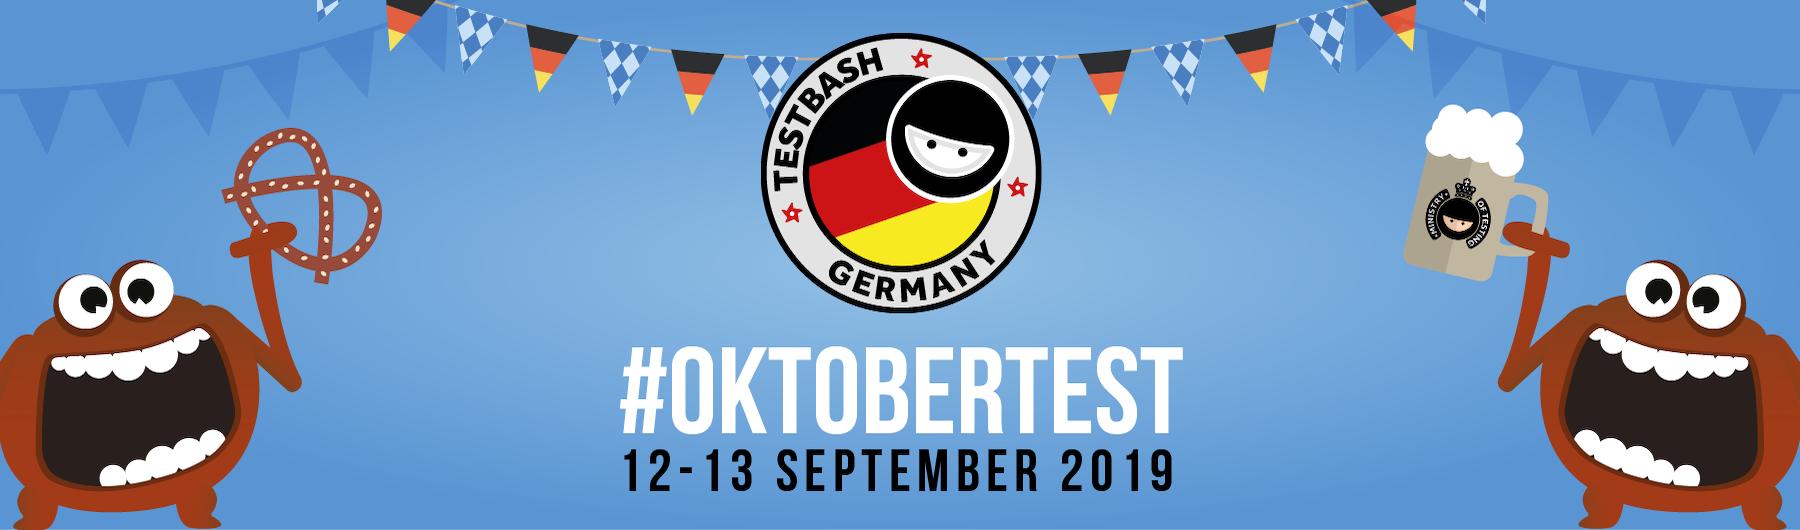 TestBash Germany 2019